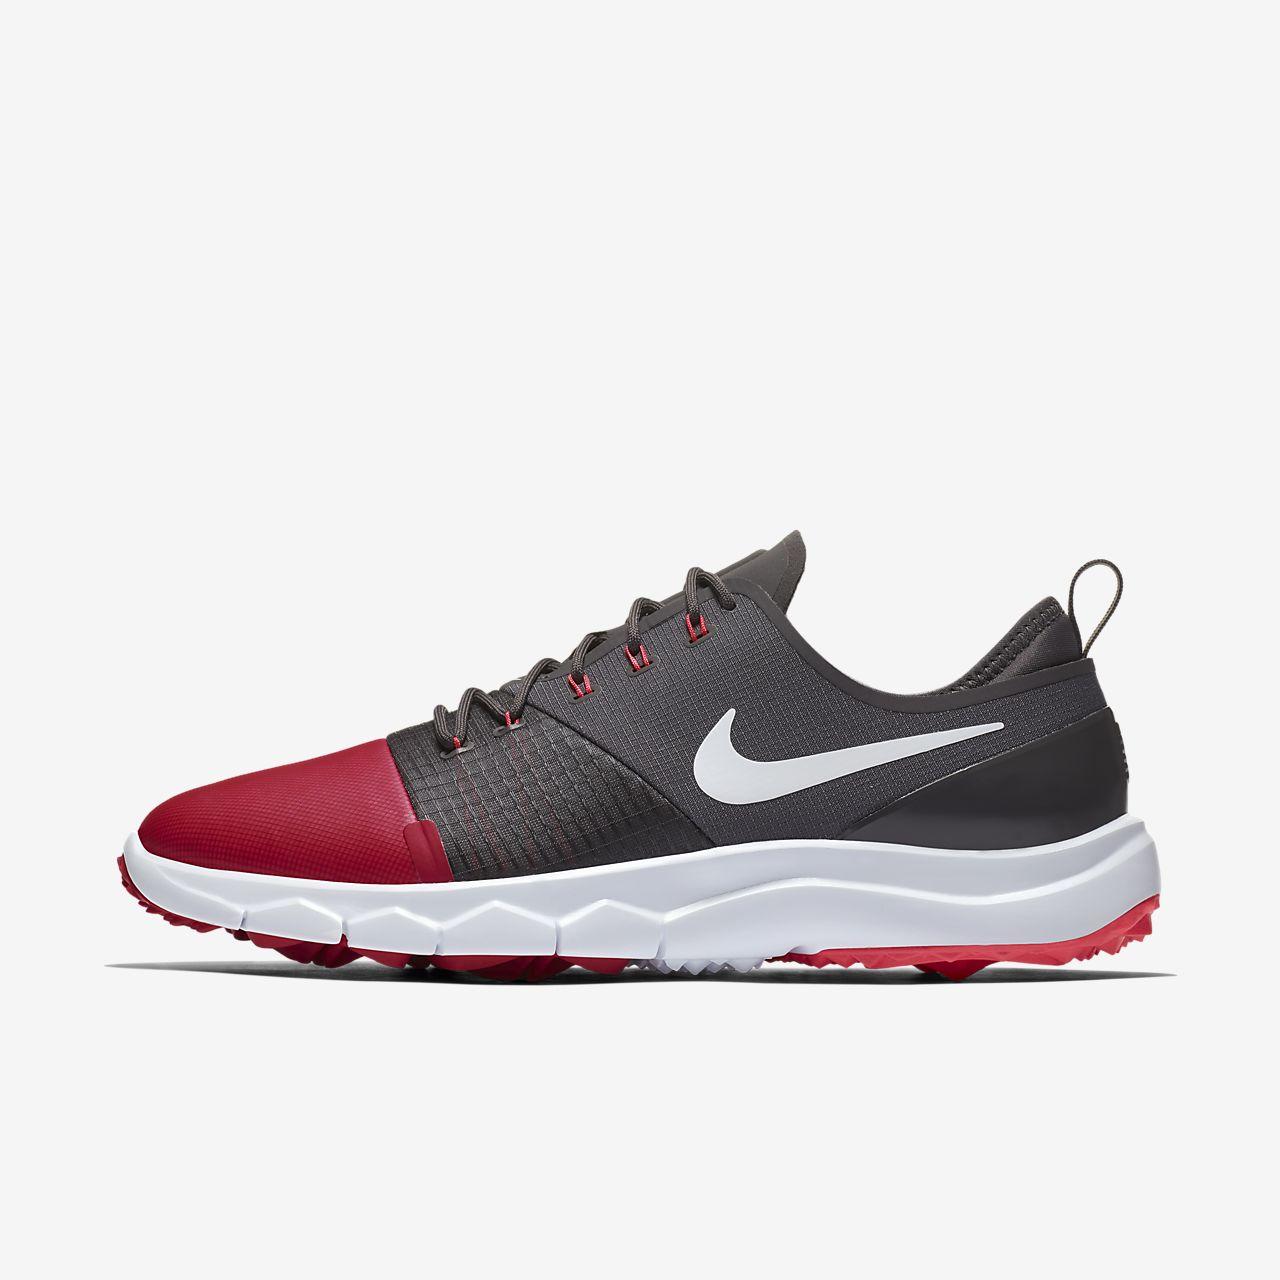 Nike FI Impact 3 női golfcipő